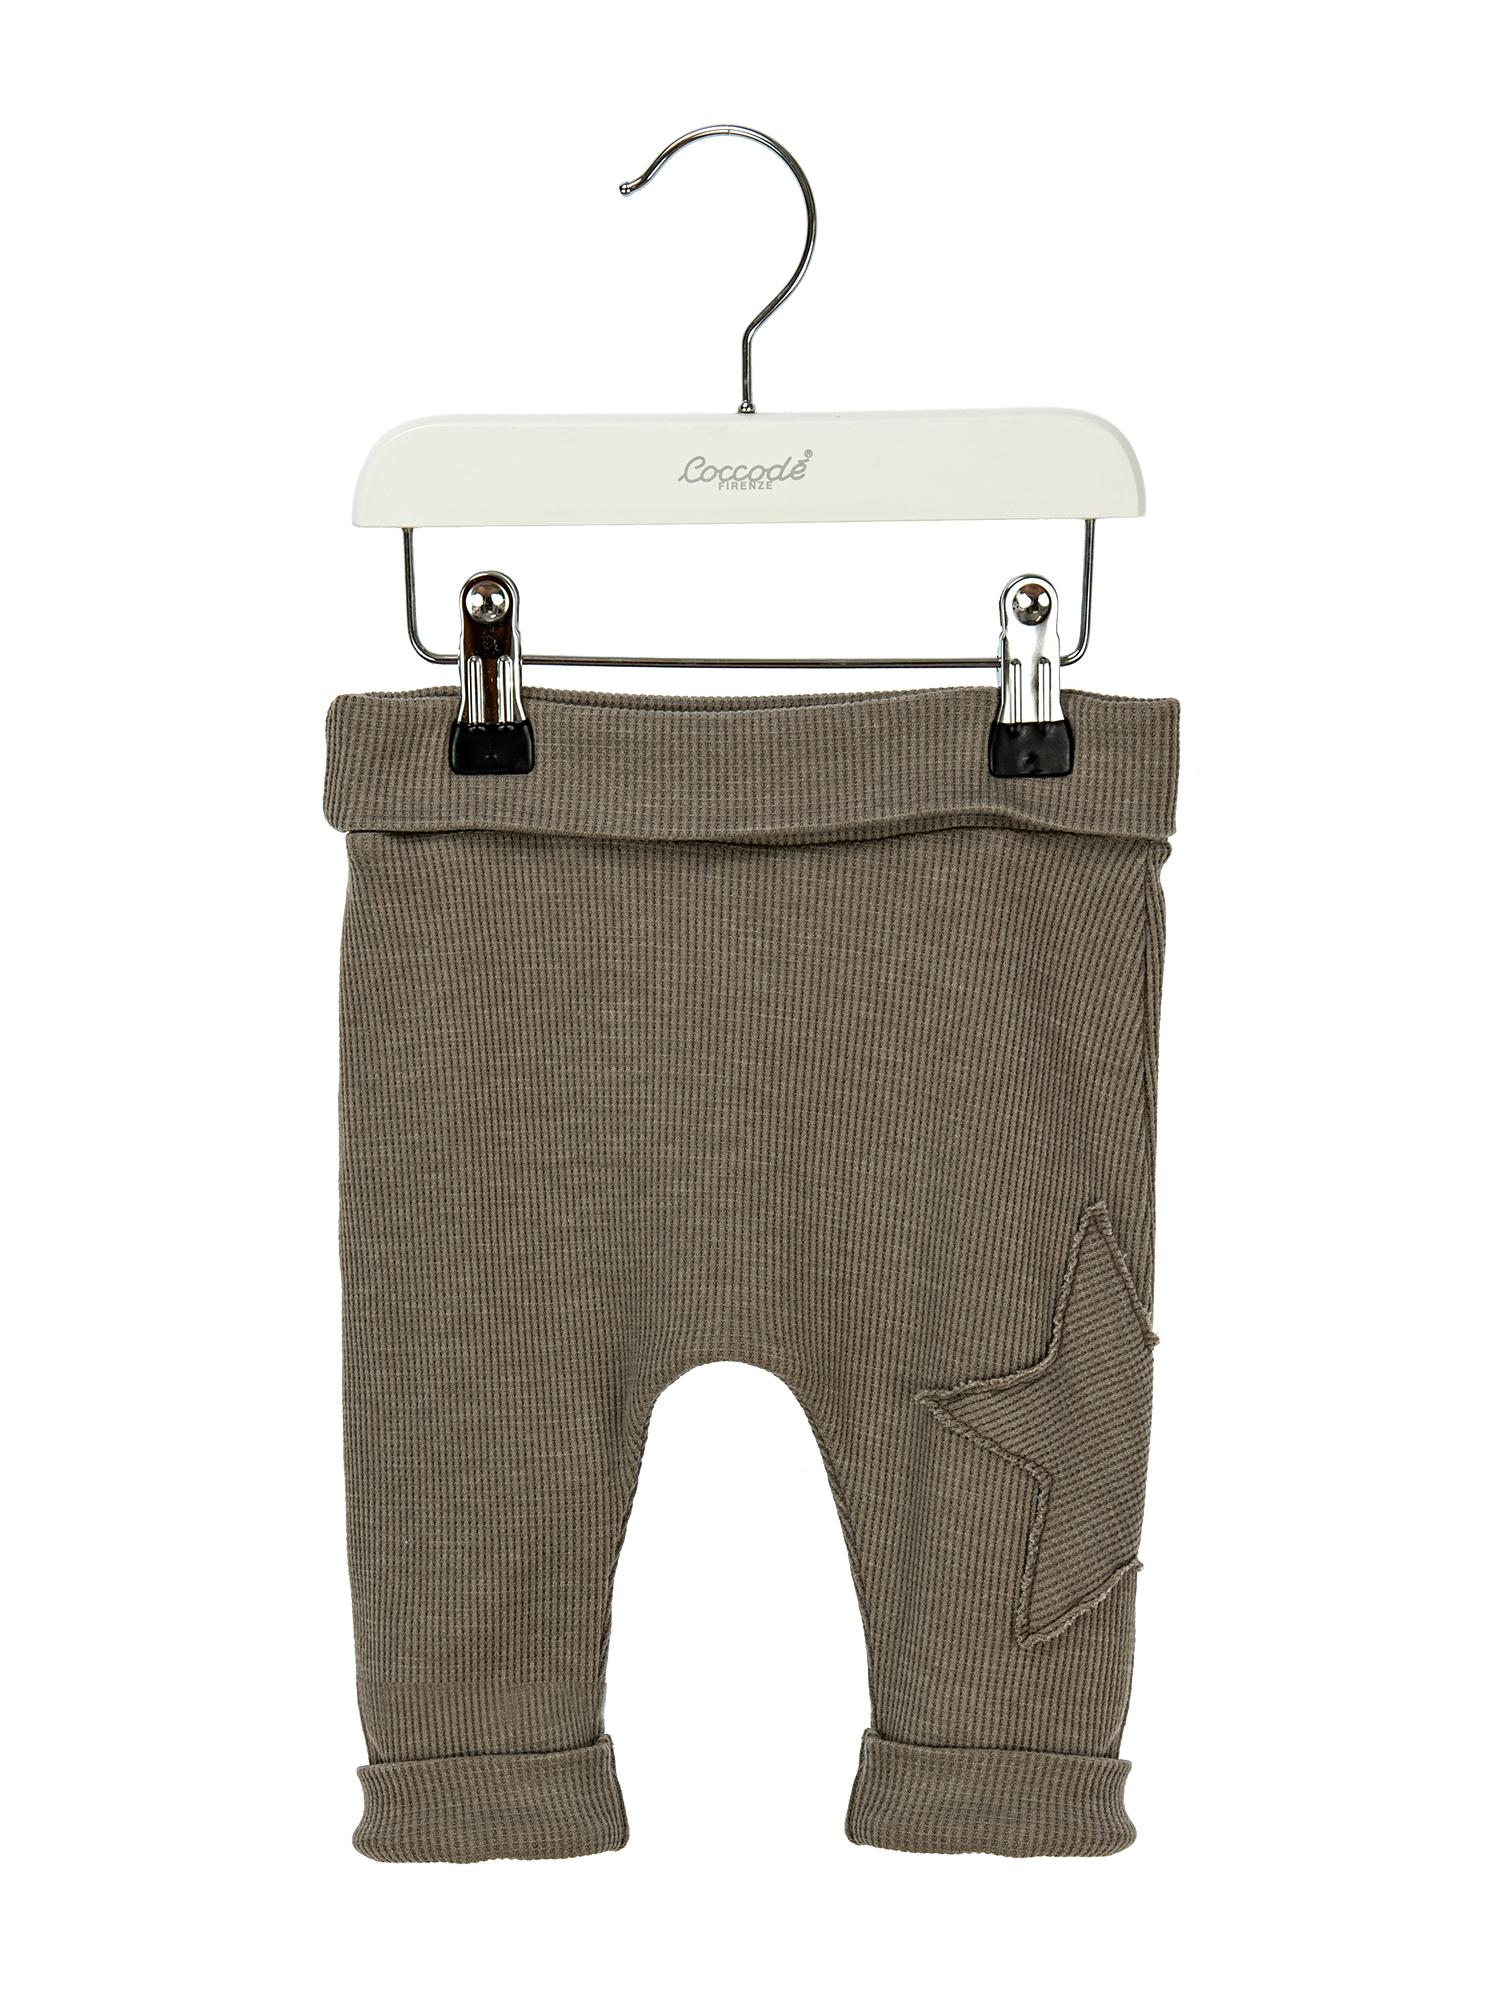 Pantalone lungo cotone operato 3-36 mesi Coccodè